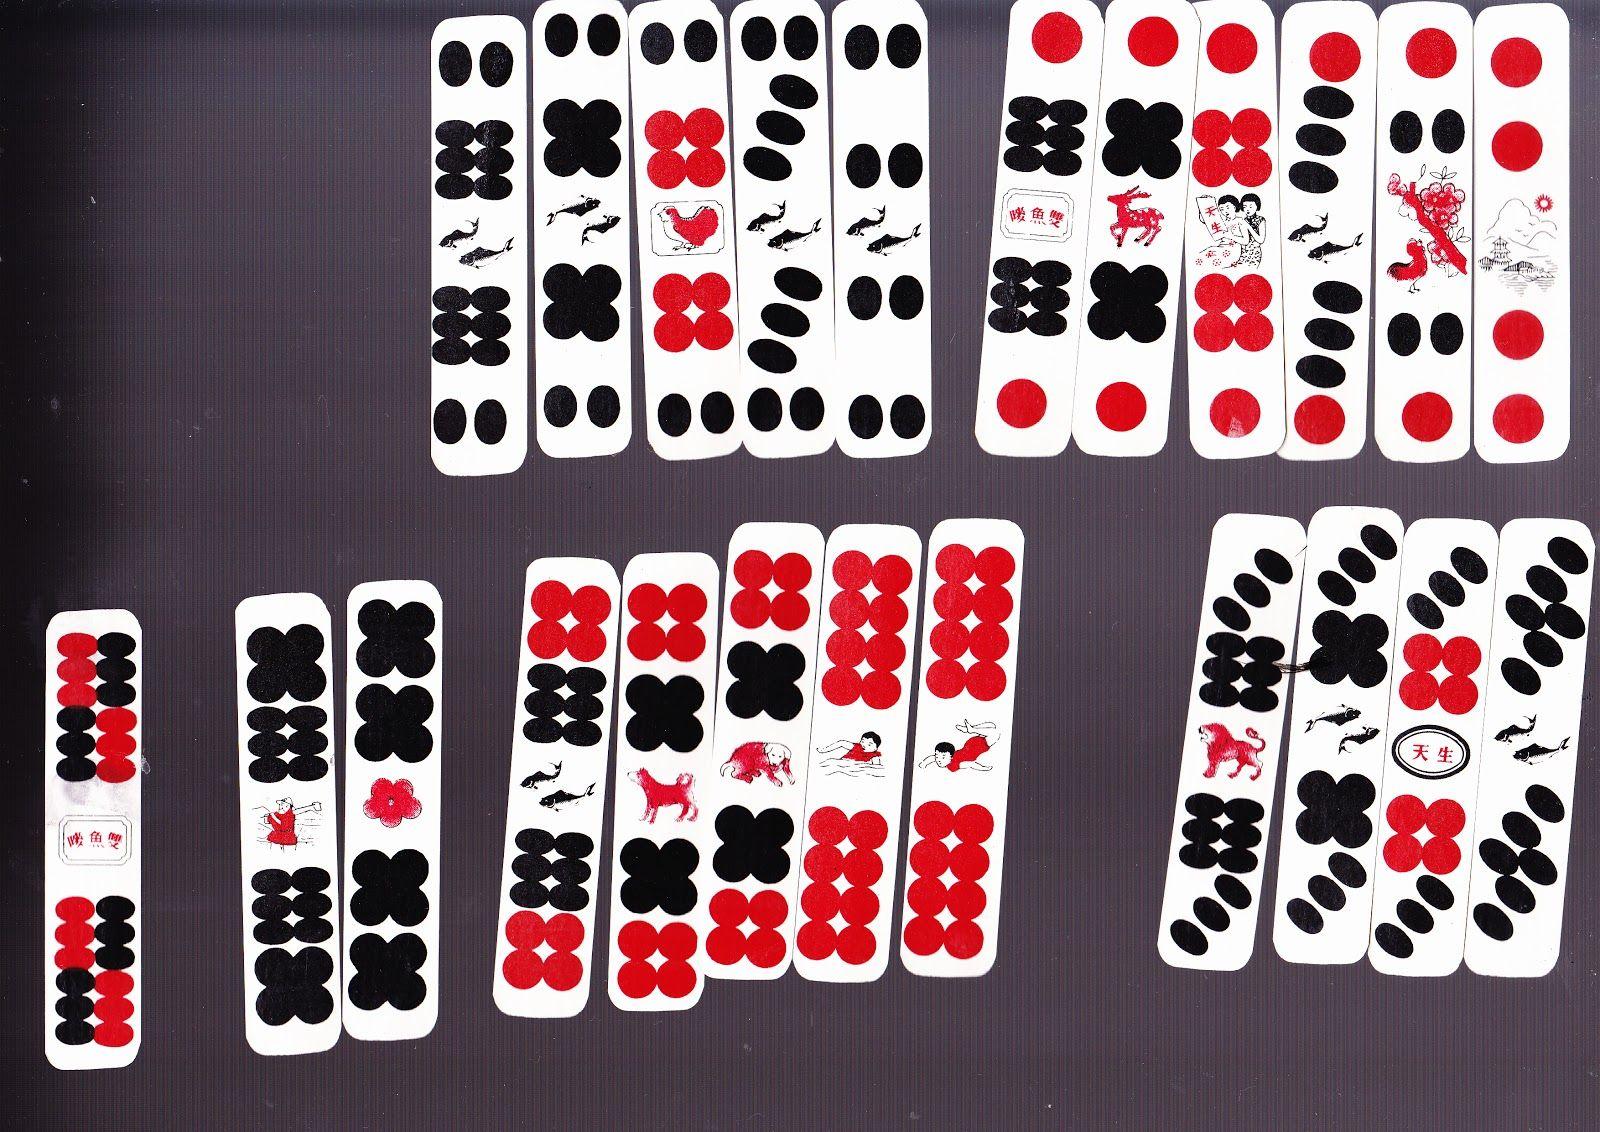 Domino Kiu Kiu Merupakan Warisan Tradisi Cina Kuno ...